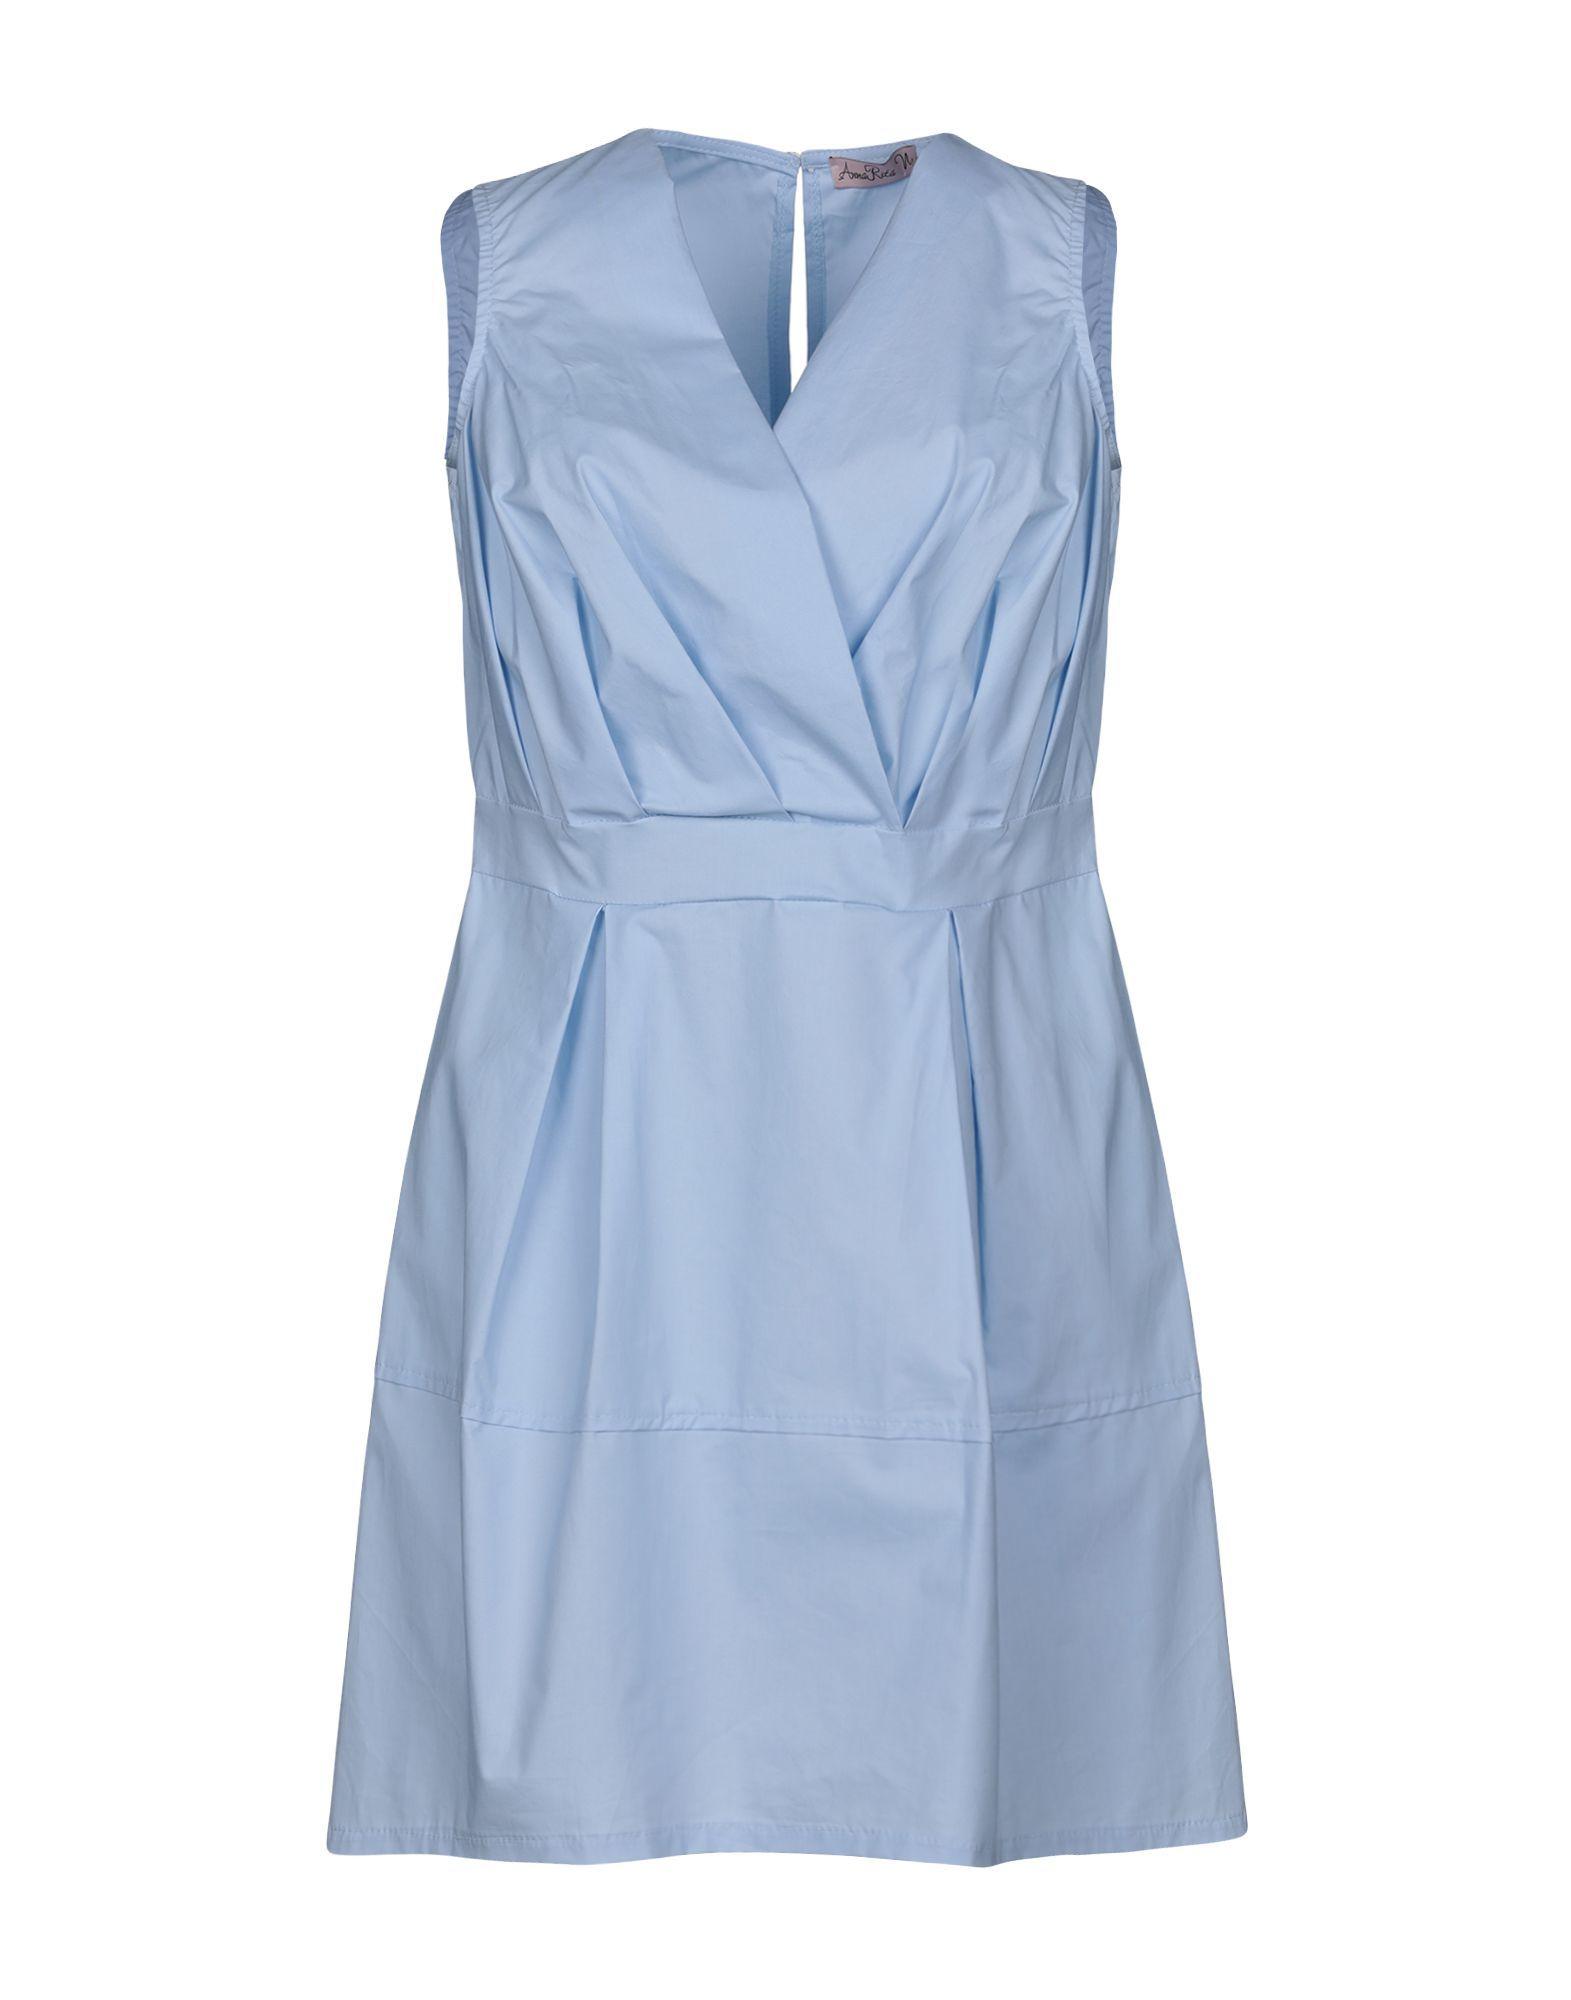 Annarita N Sky Blue Cotton Short Dress